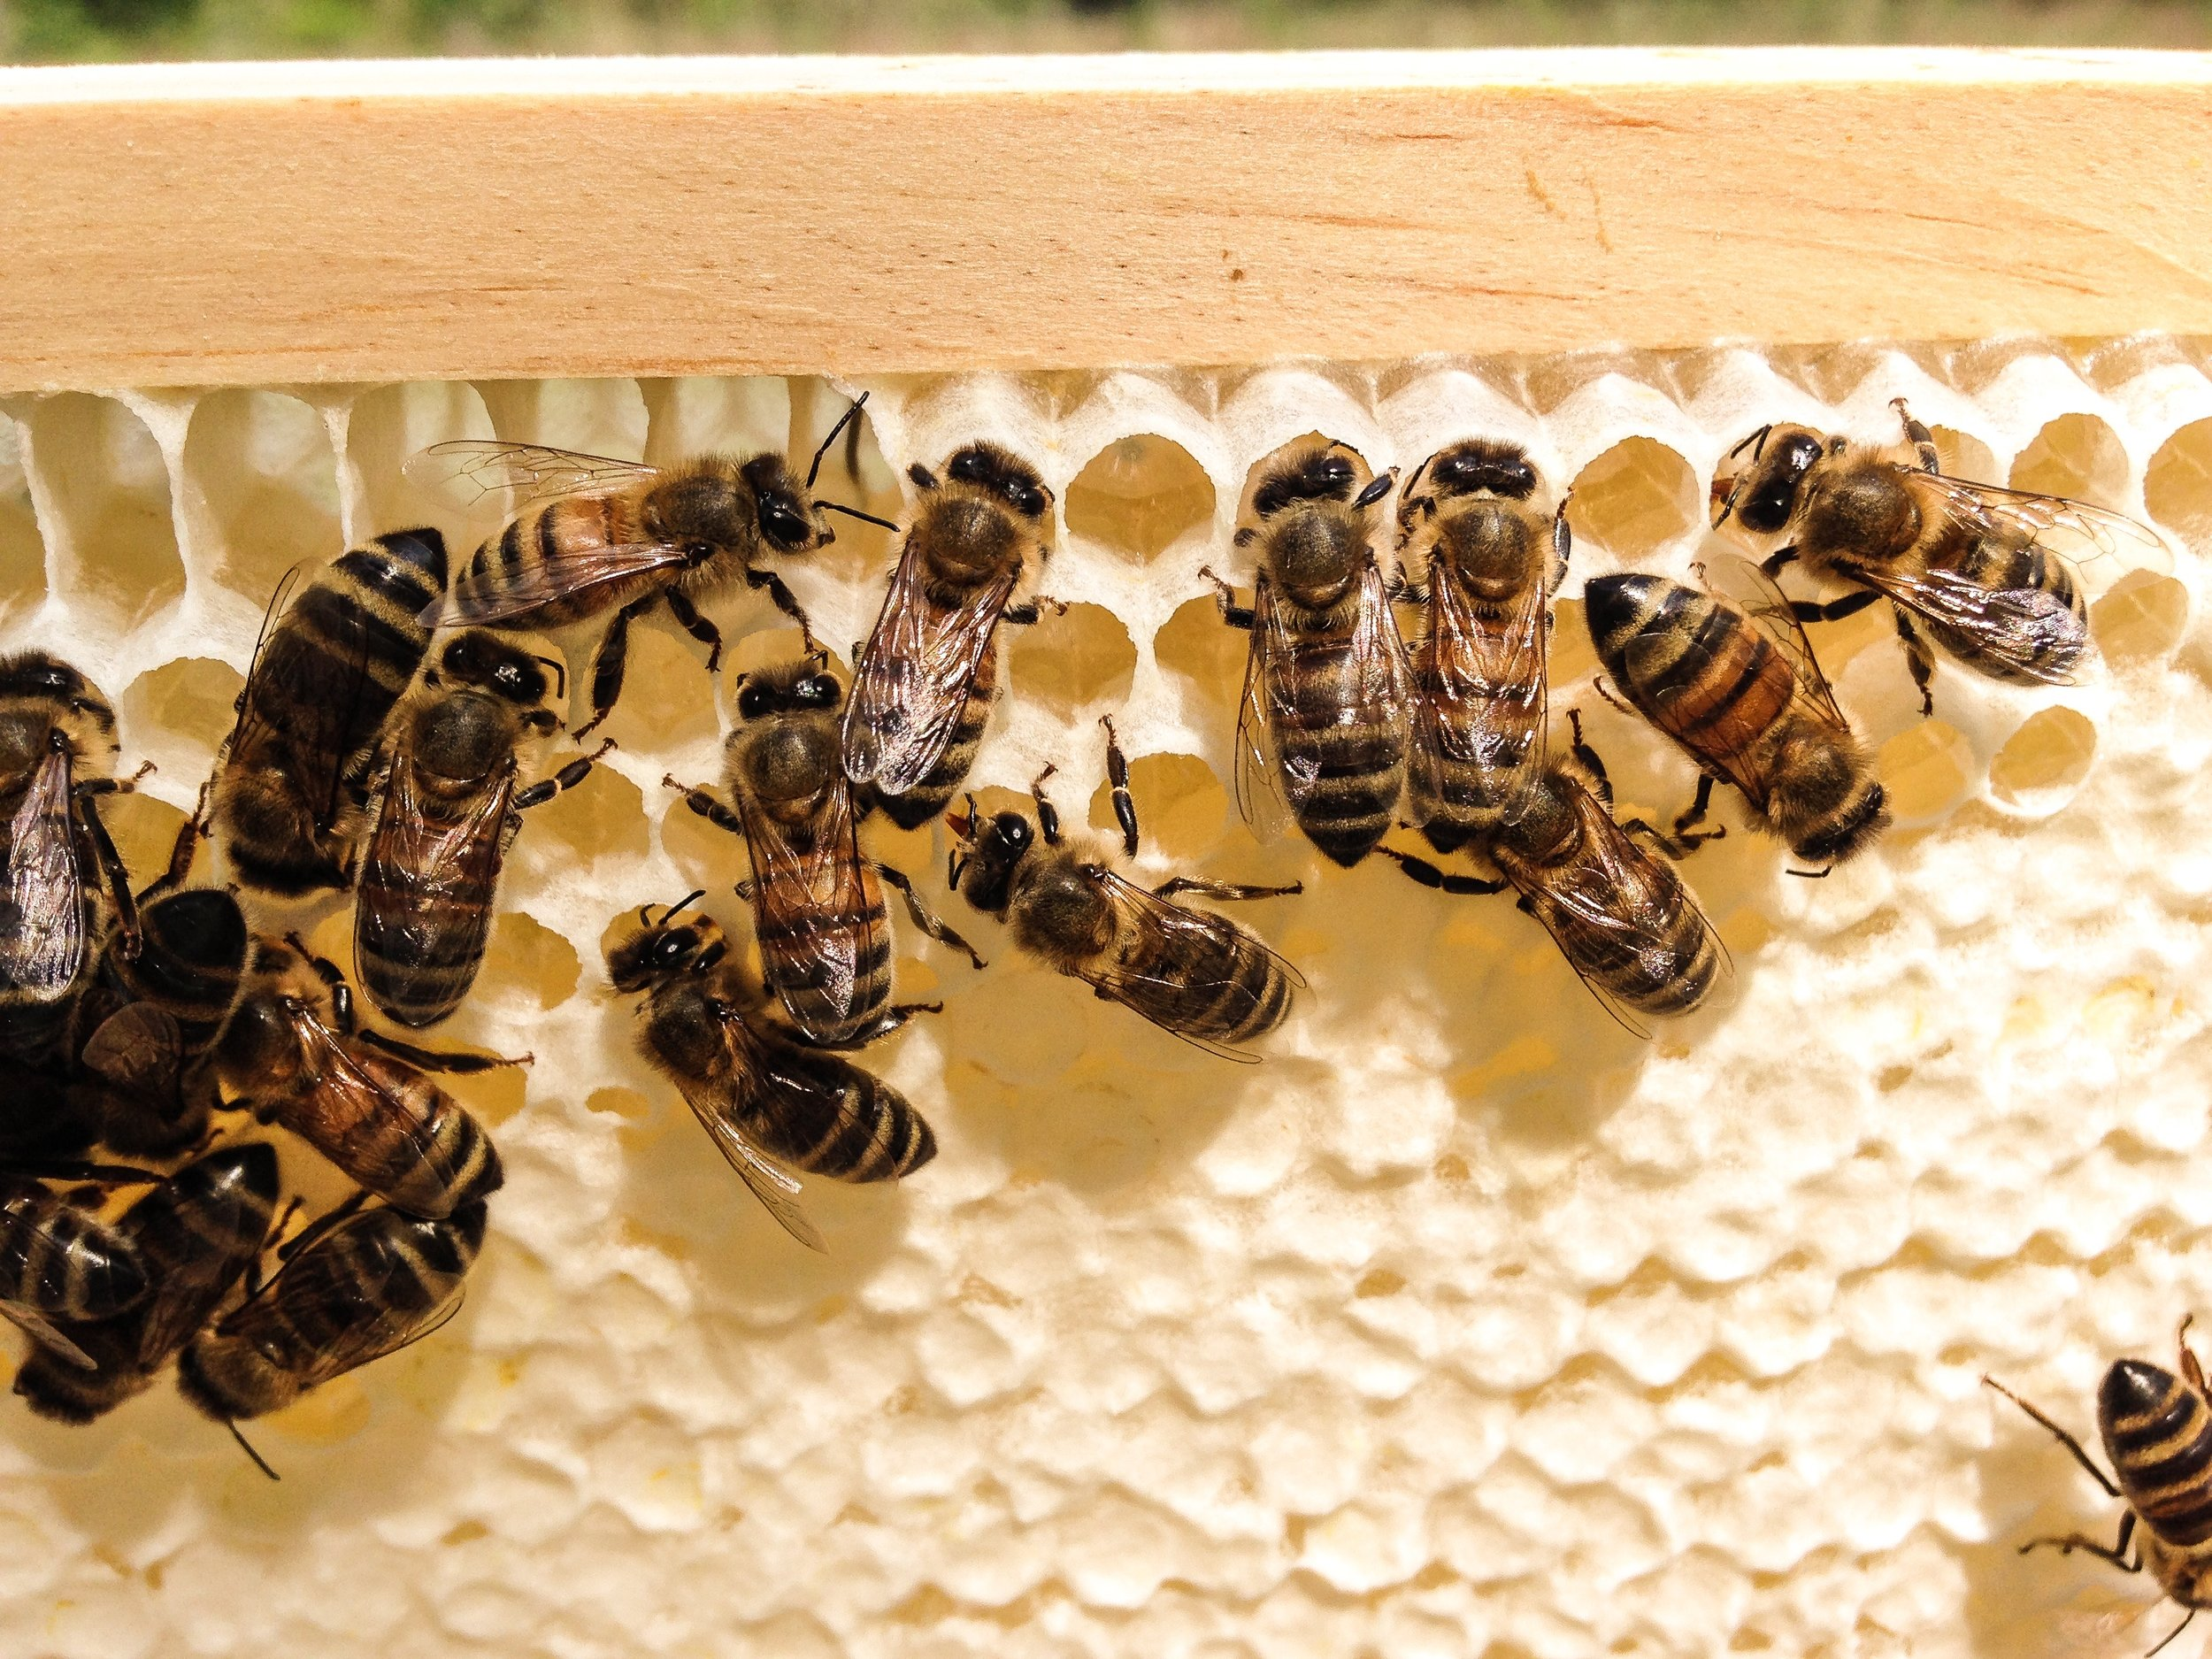 Capped honey ready to harvest